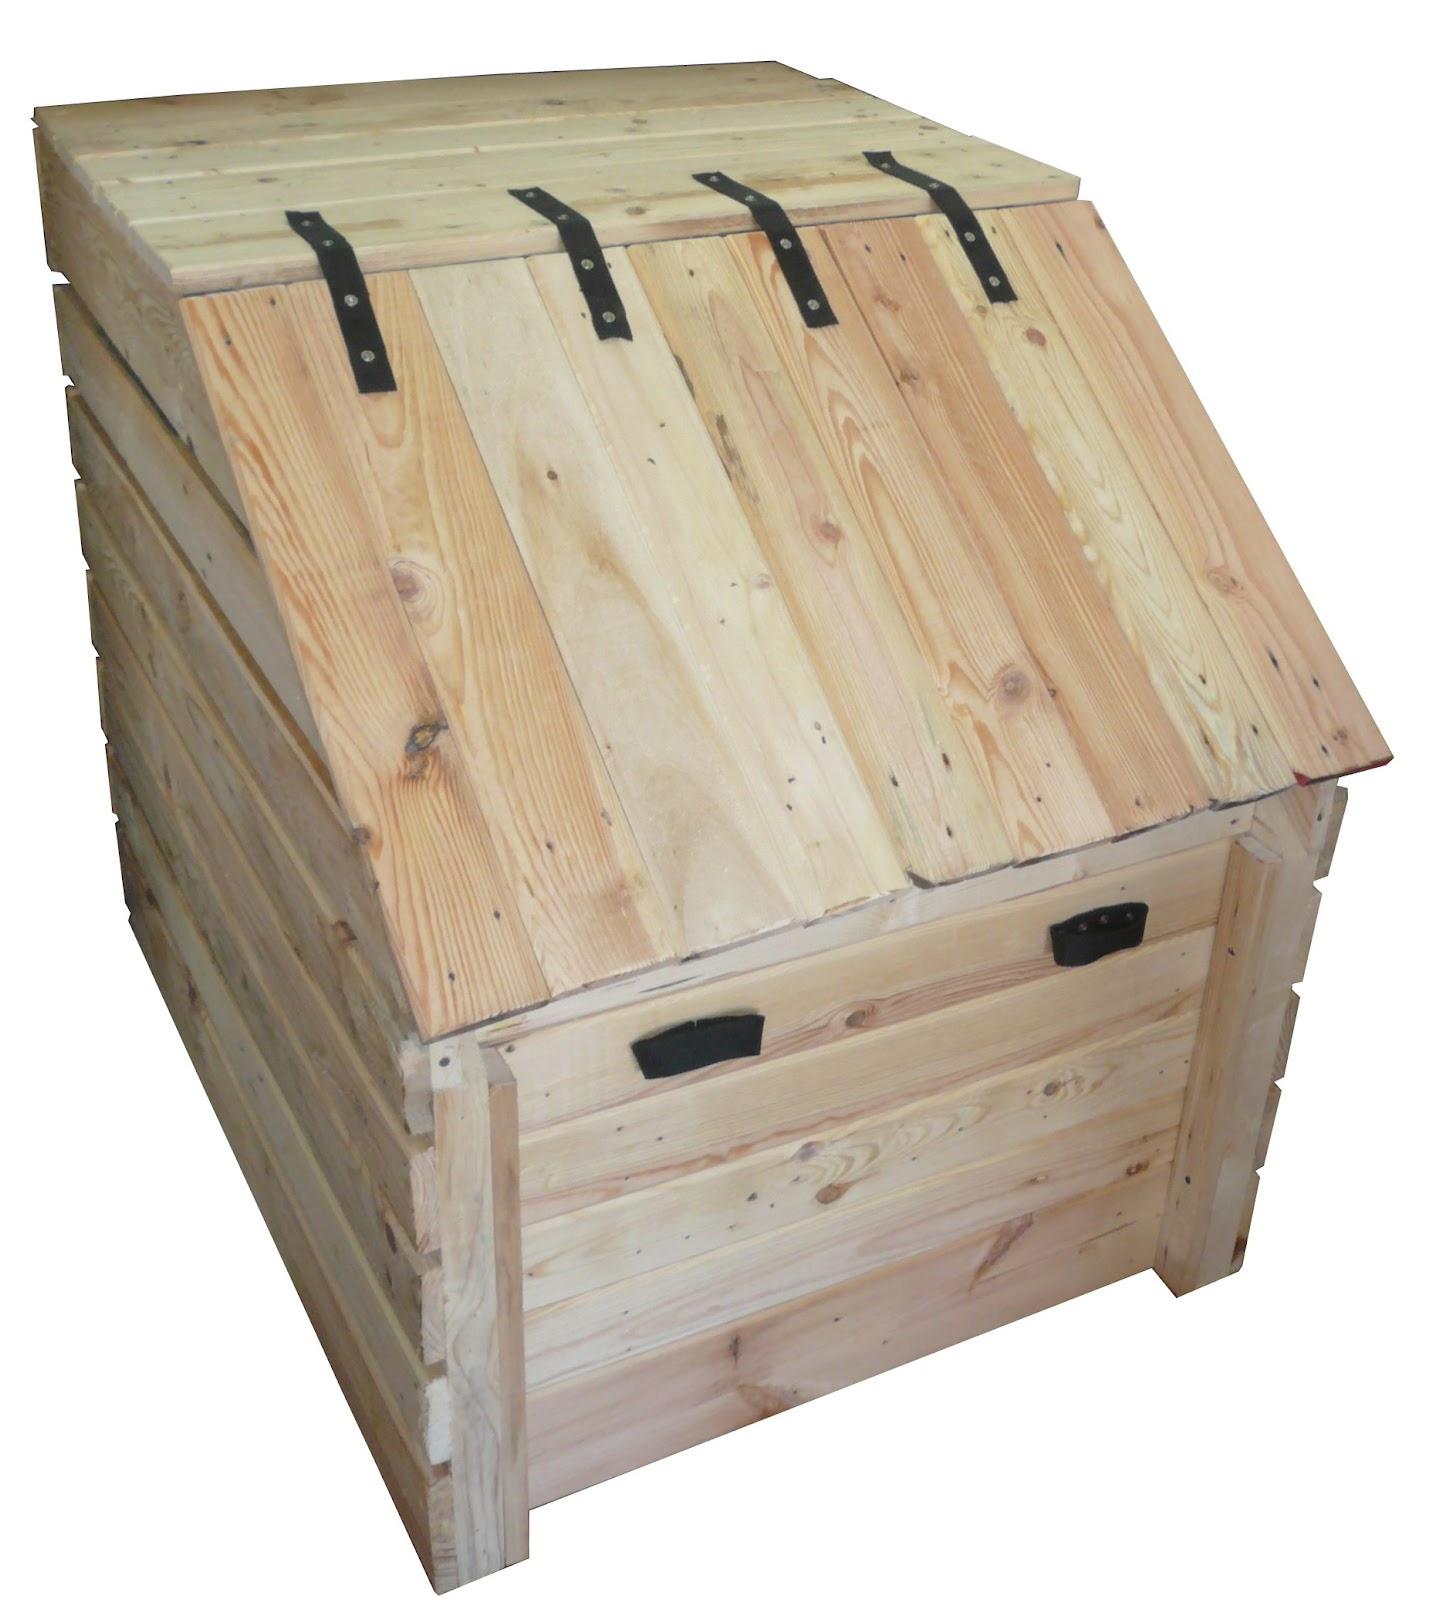 composteur palettes 960 litres palettes de solutions strasbourg. Black Bedroom Furniture Sets. Home Design Ideas